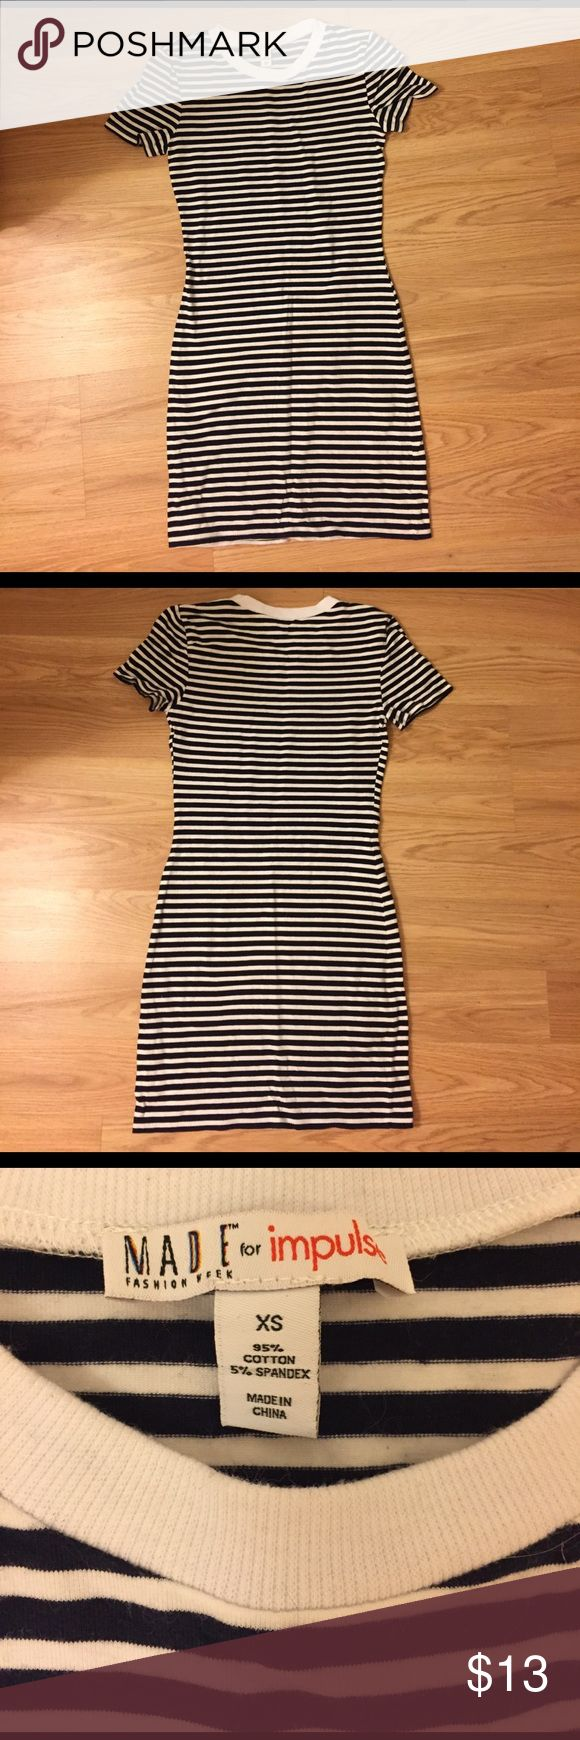 Striped bodycon dress Striped bodycon dress. White and navy blue stripes. MADE for impulse  Dresses Mini